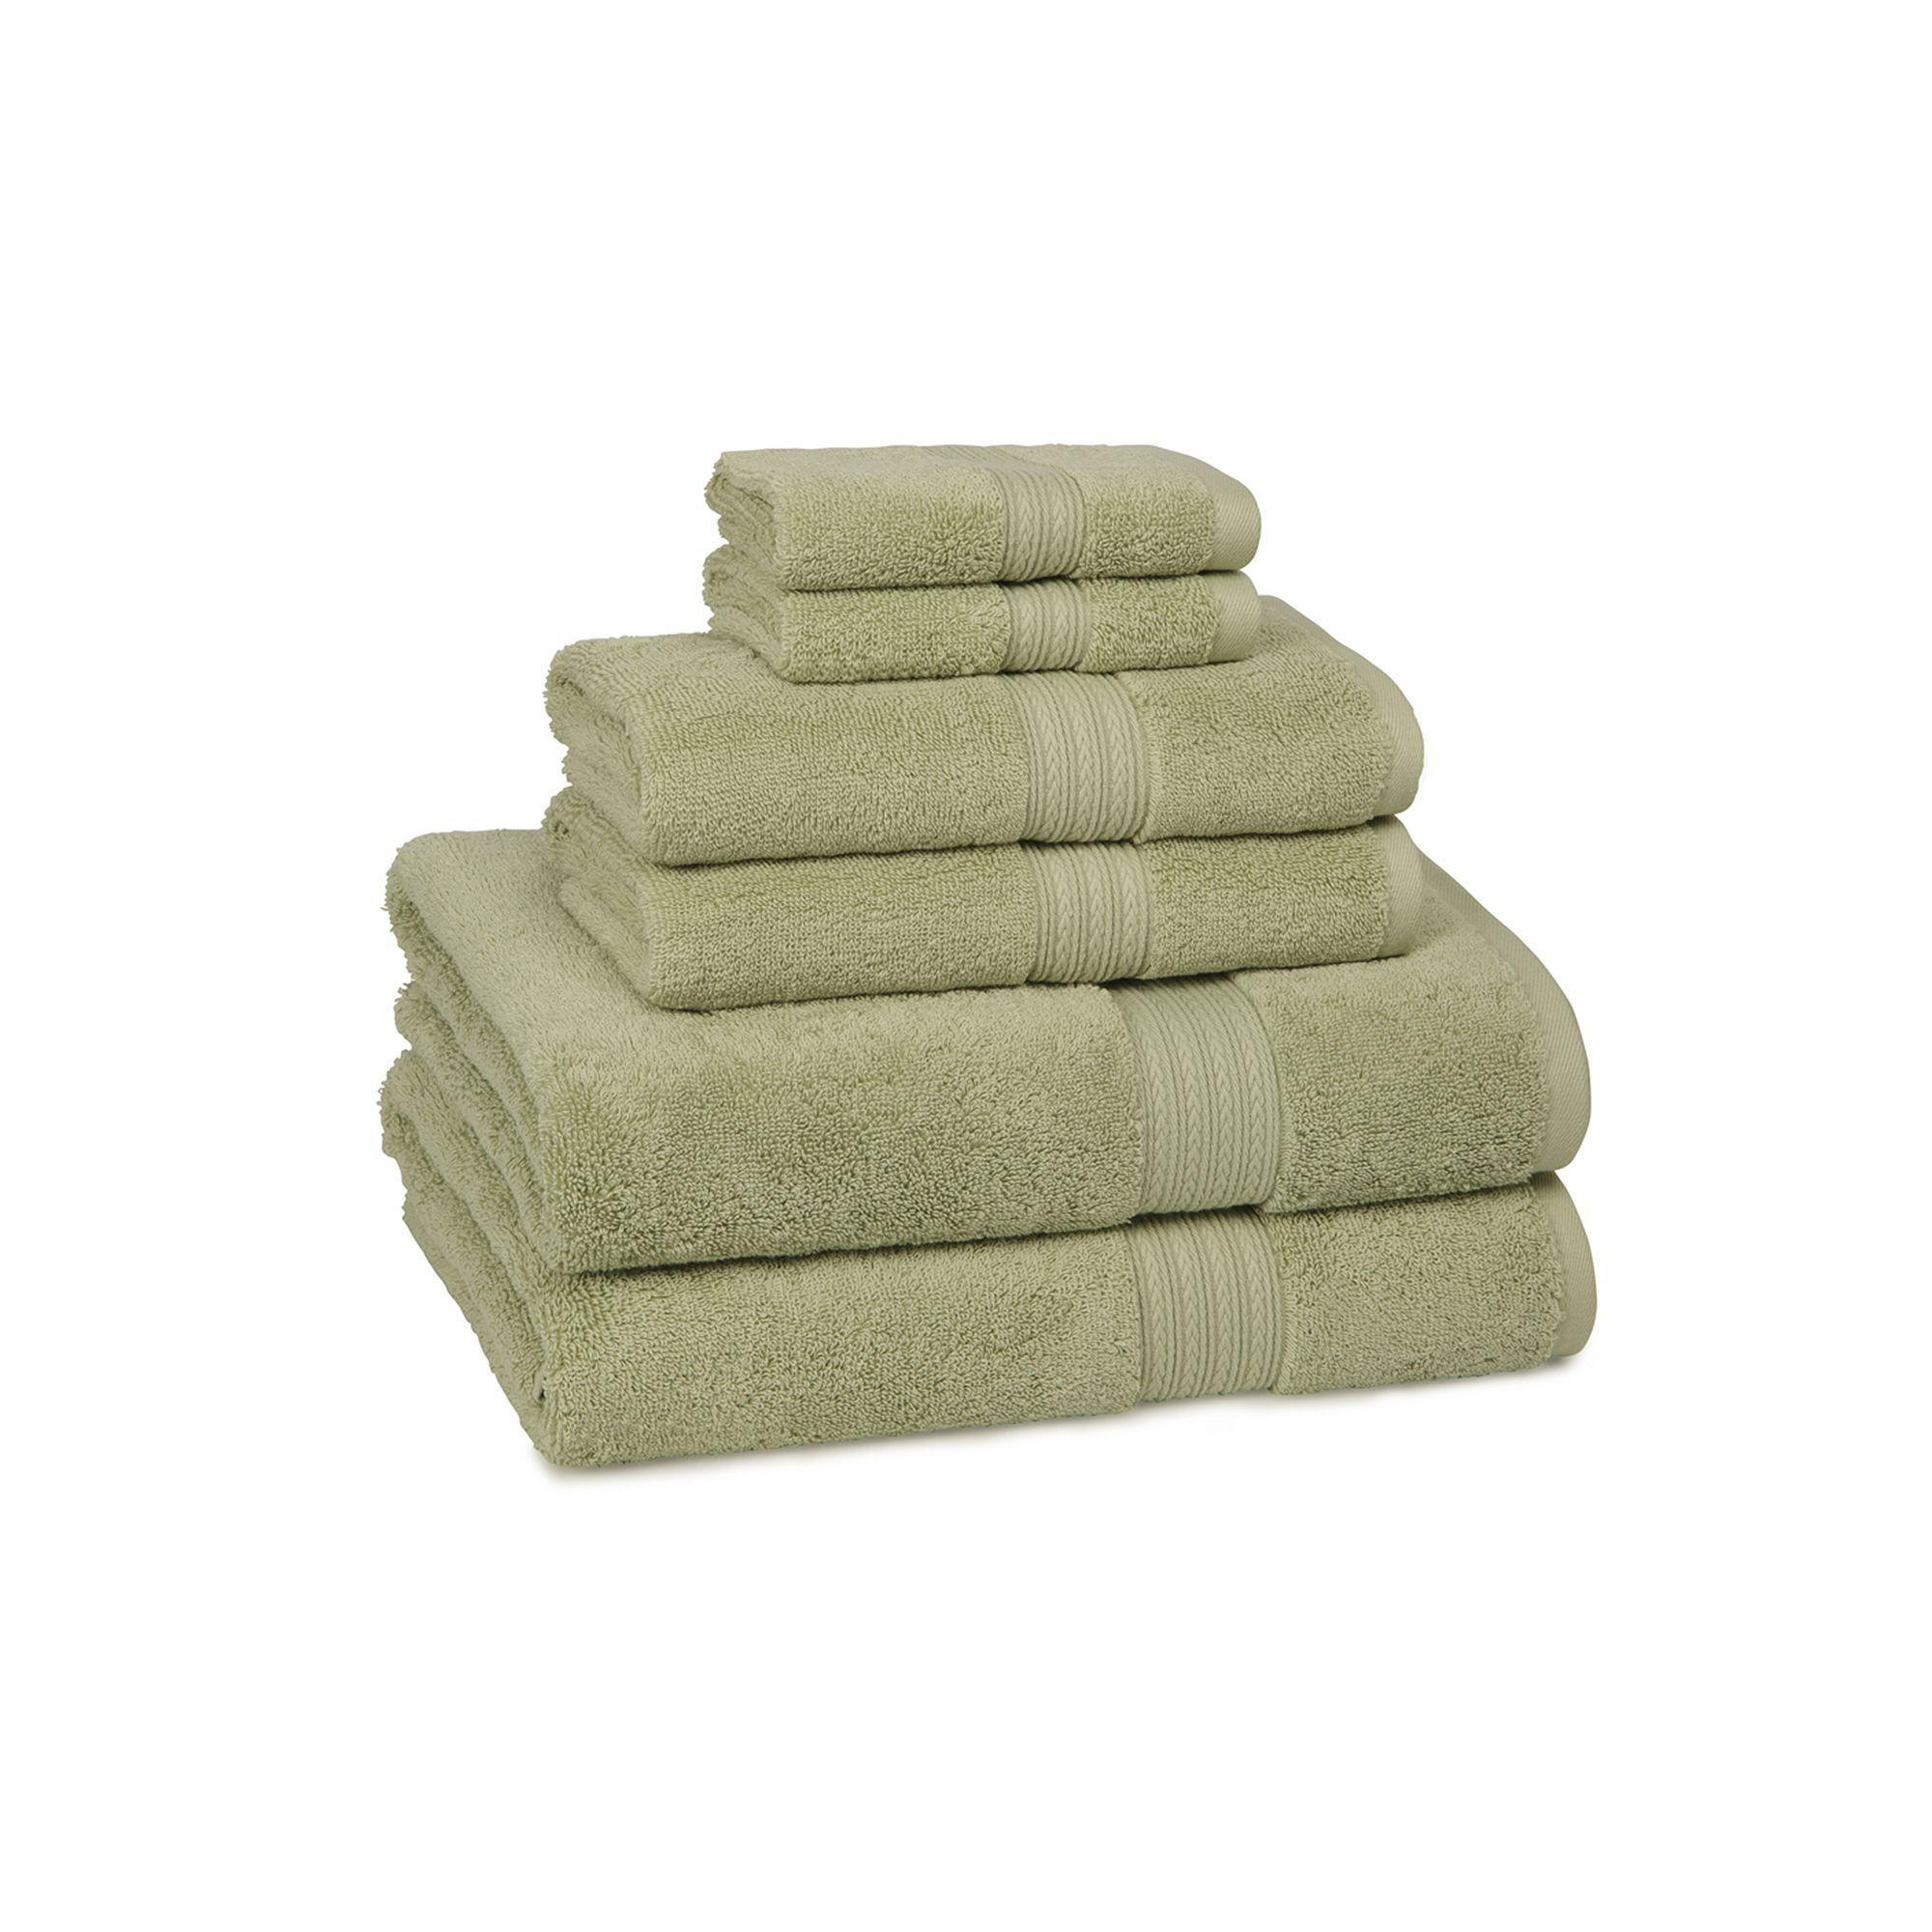 Cassadecor Signature Solid 6 Pc Bath Towel Set Egyptian Cotton